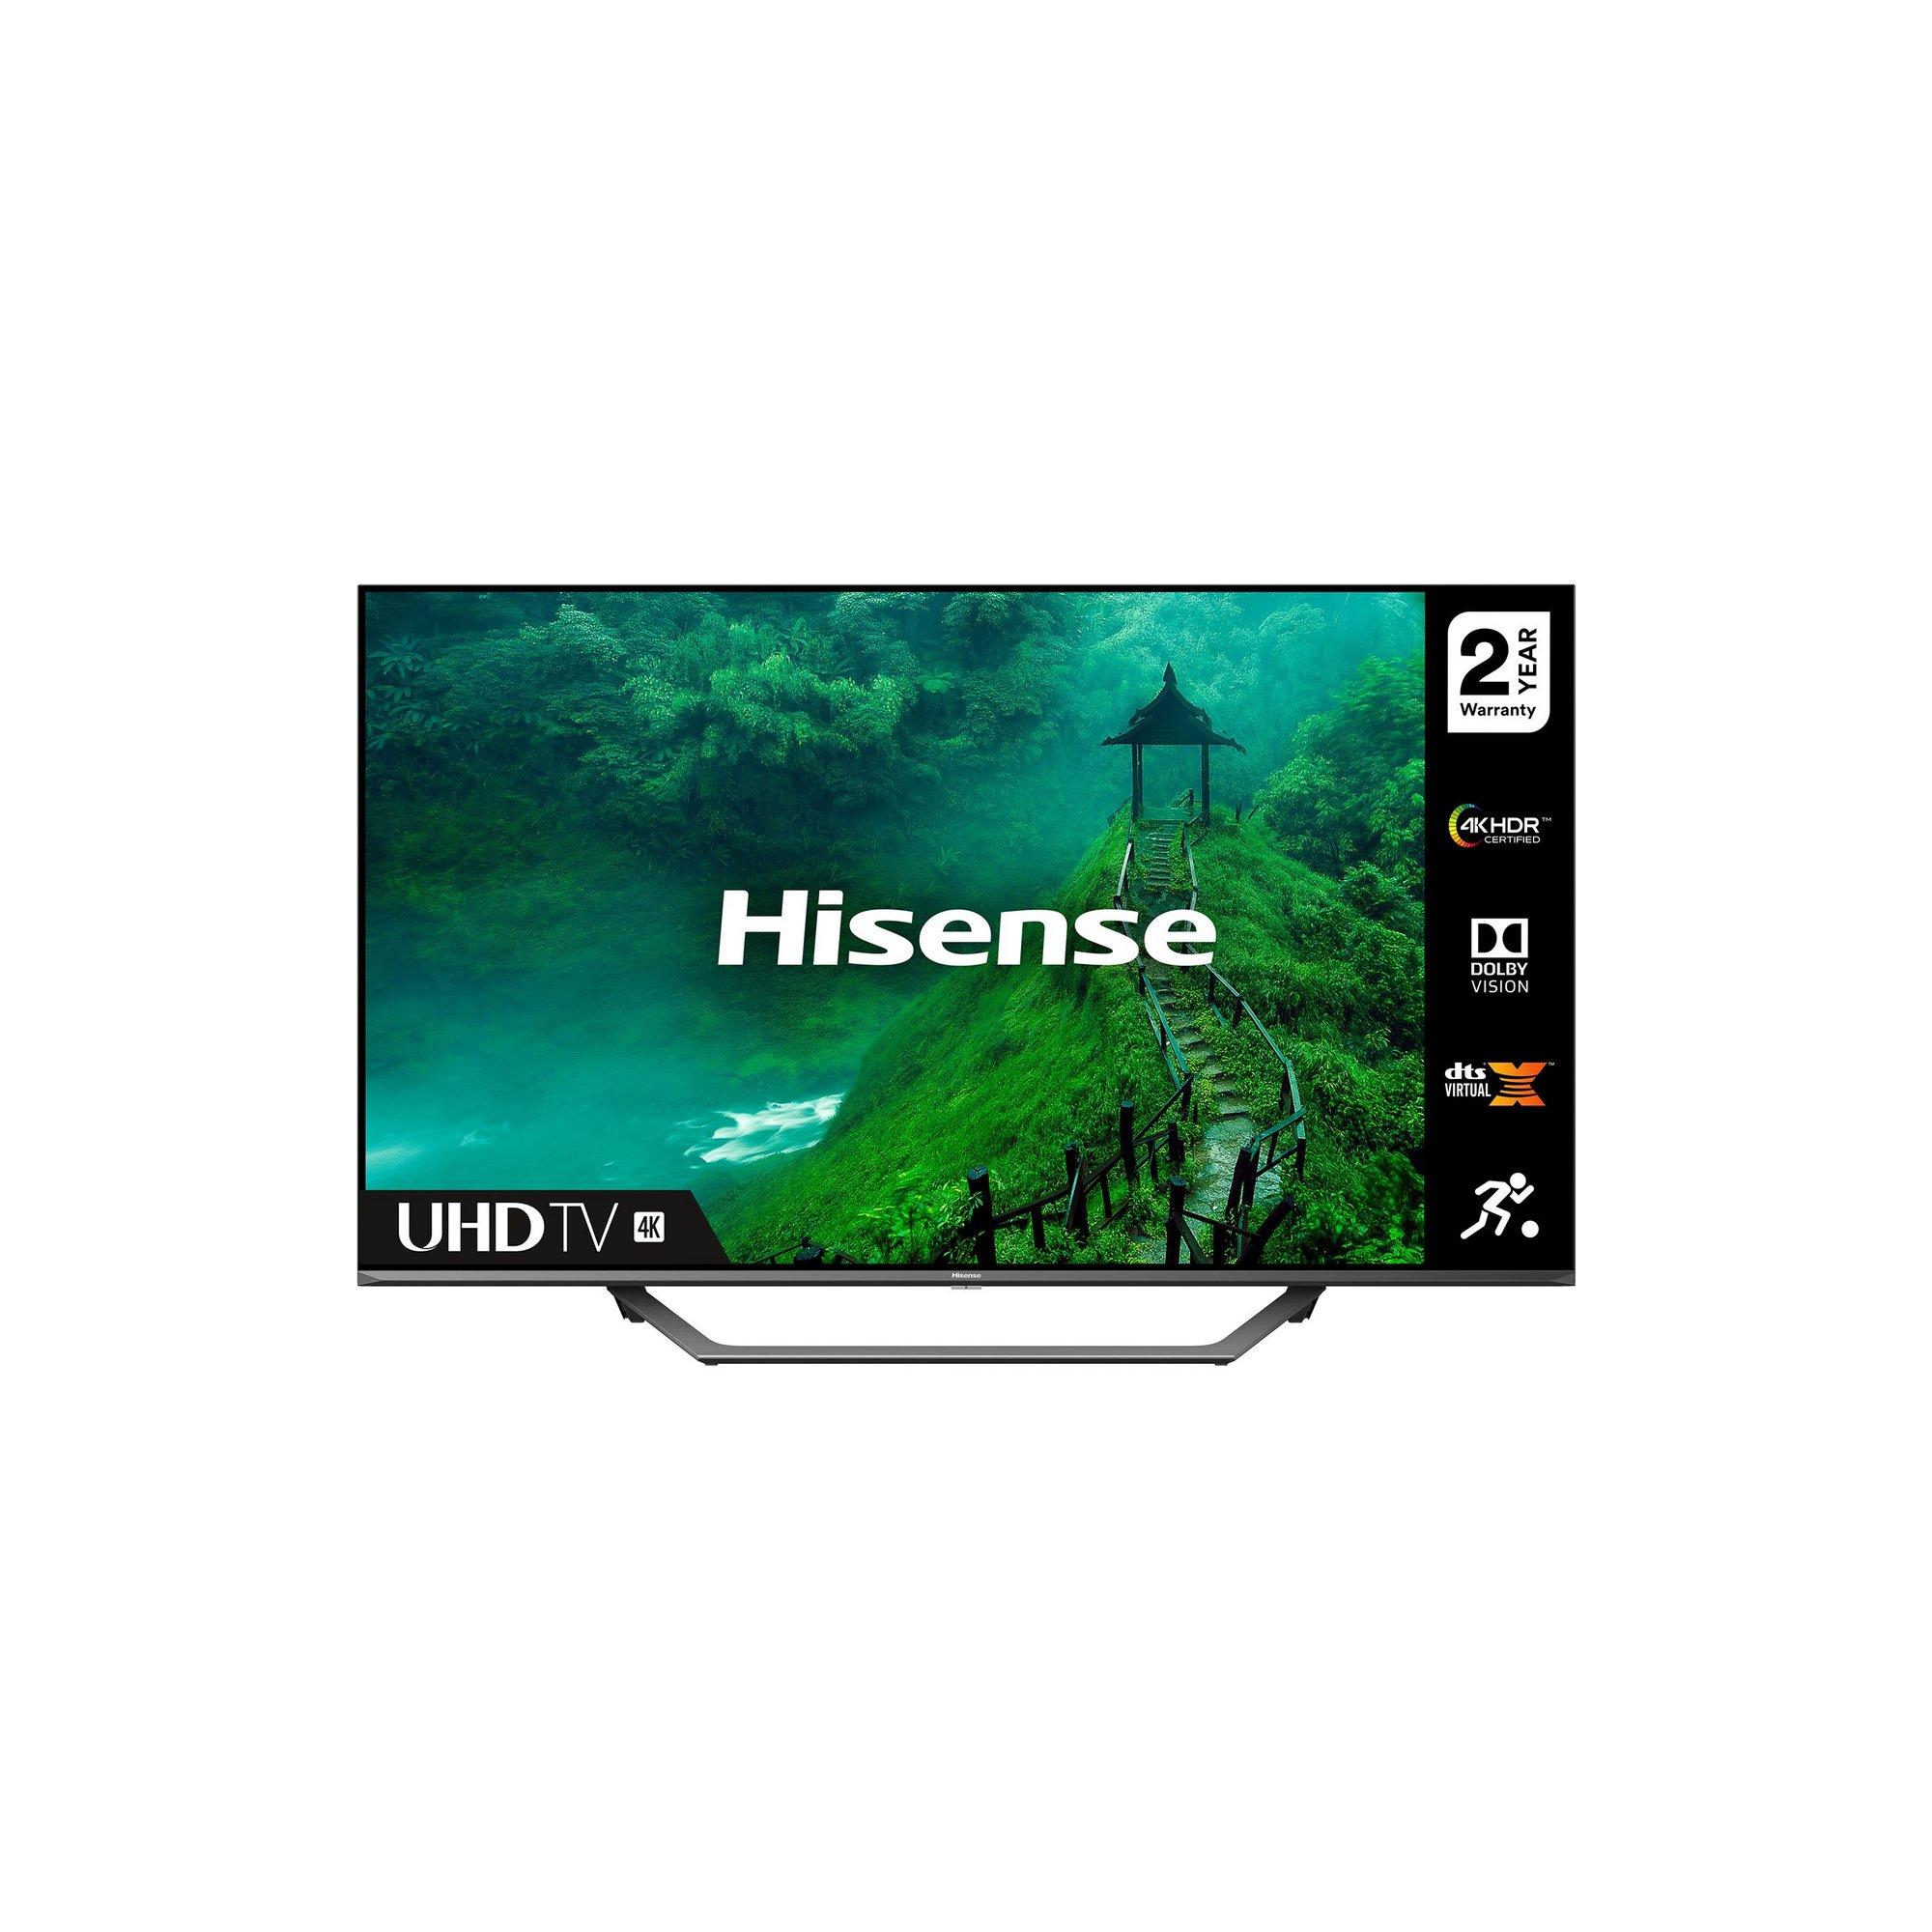 Image of Hisense 43 Inch 43AE7400FTUK LED HDR 4K Ultra HD Smart TV